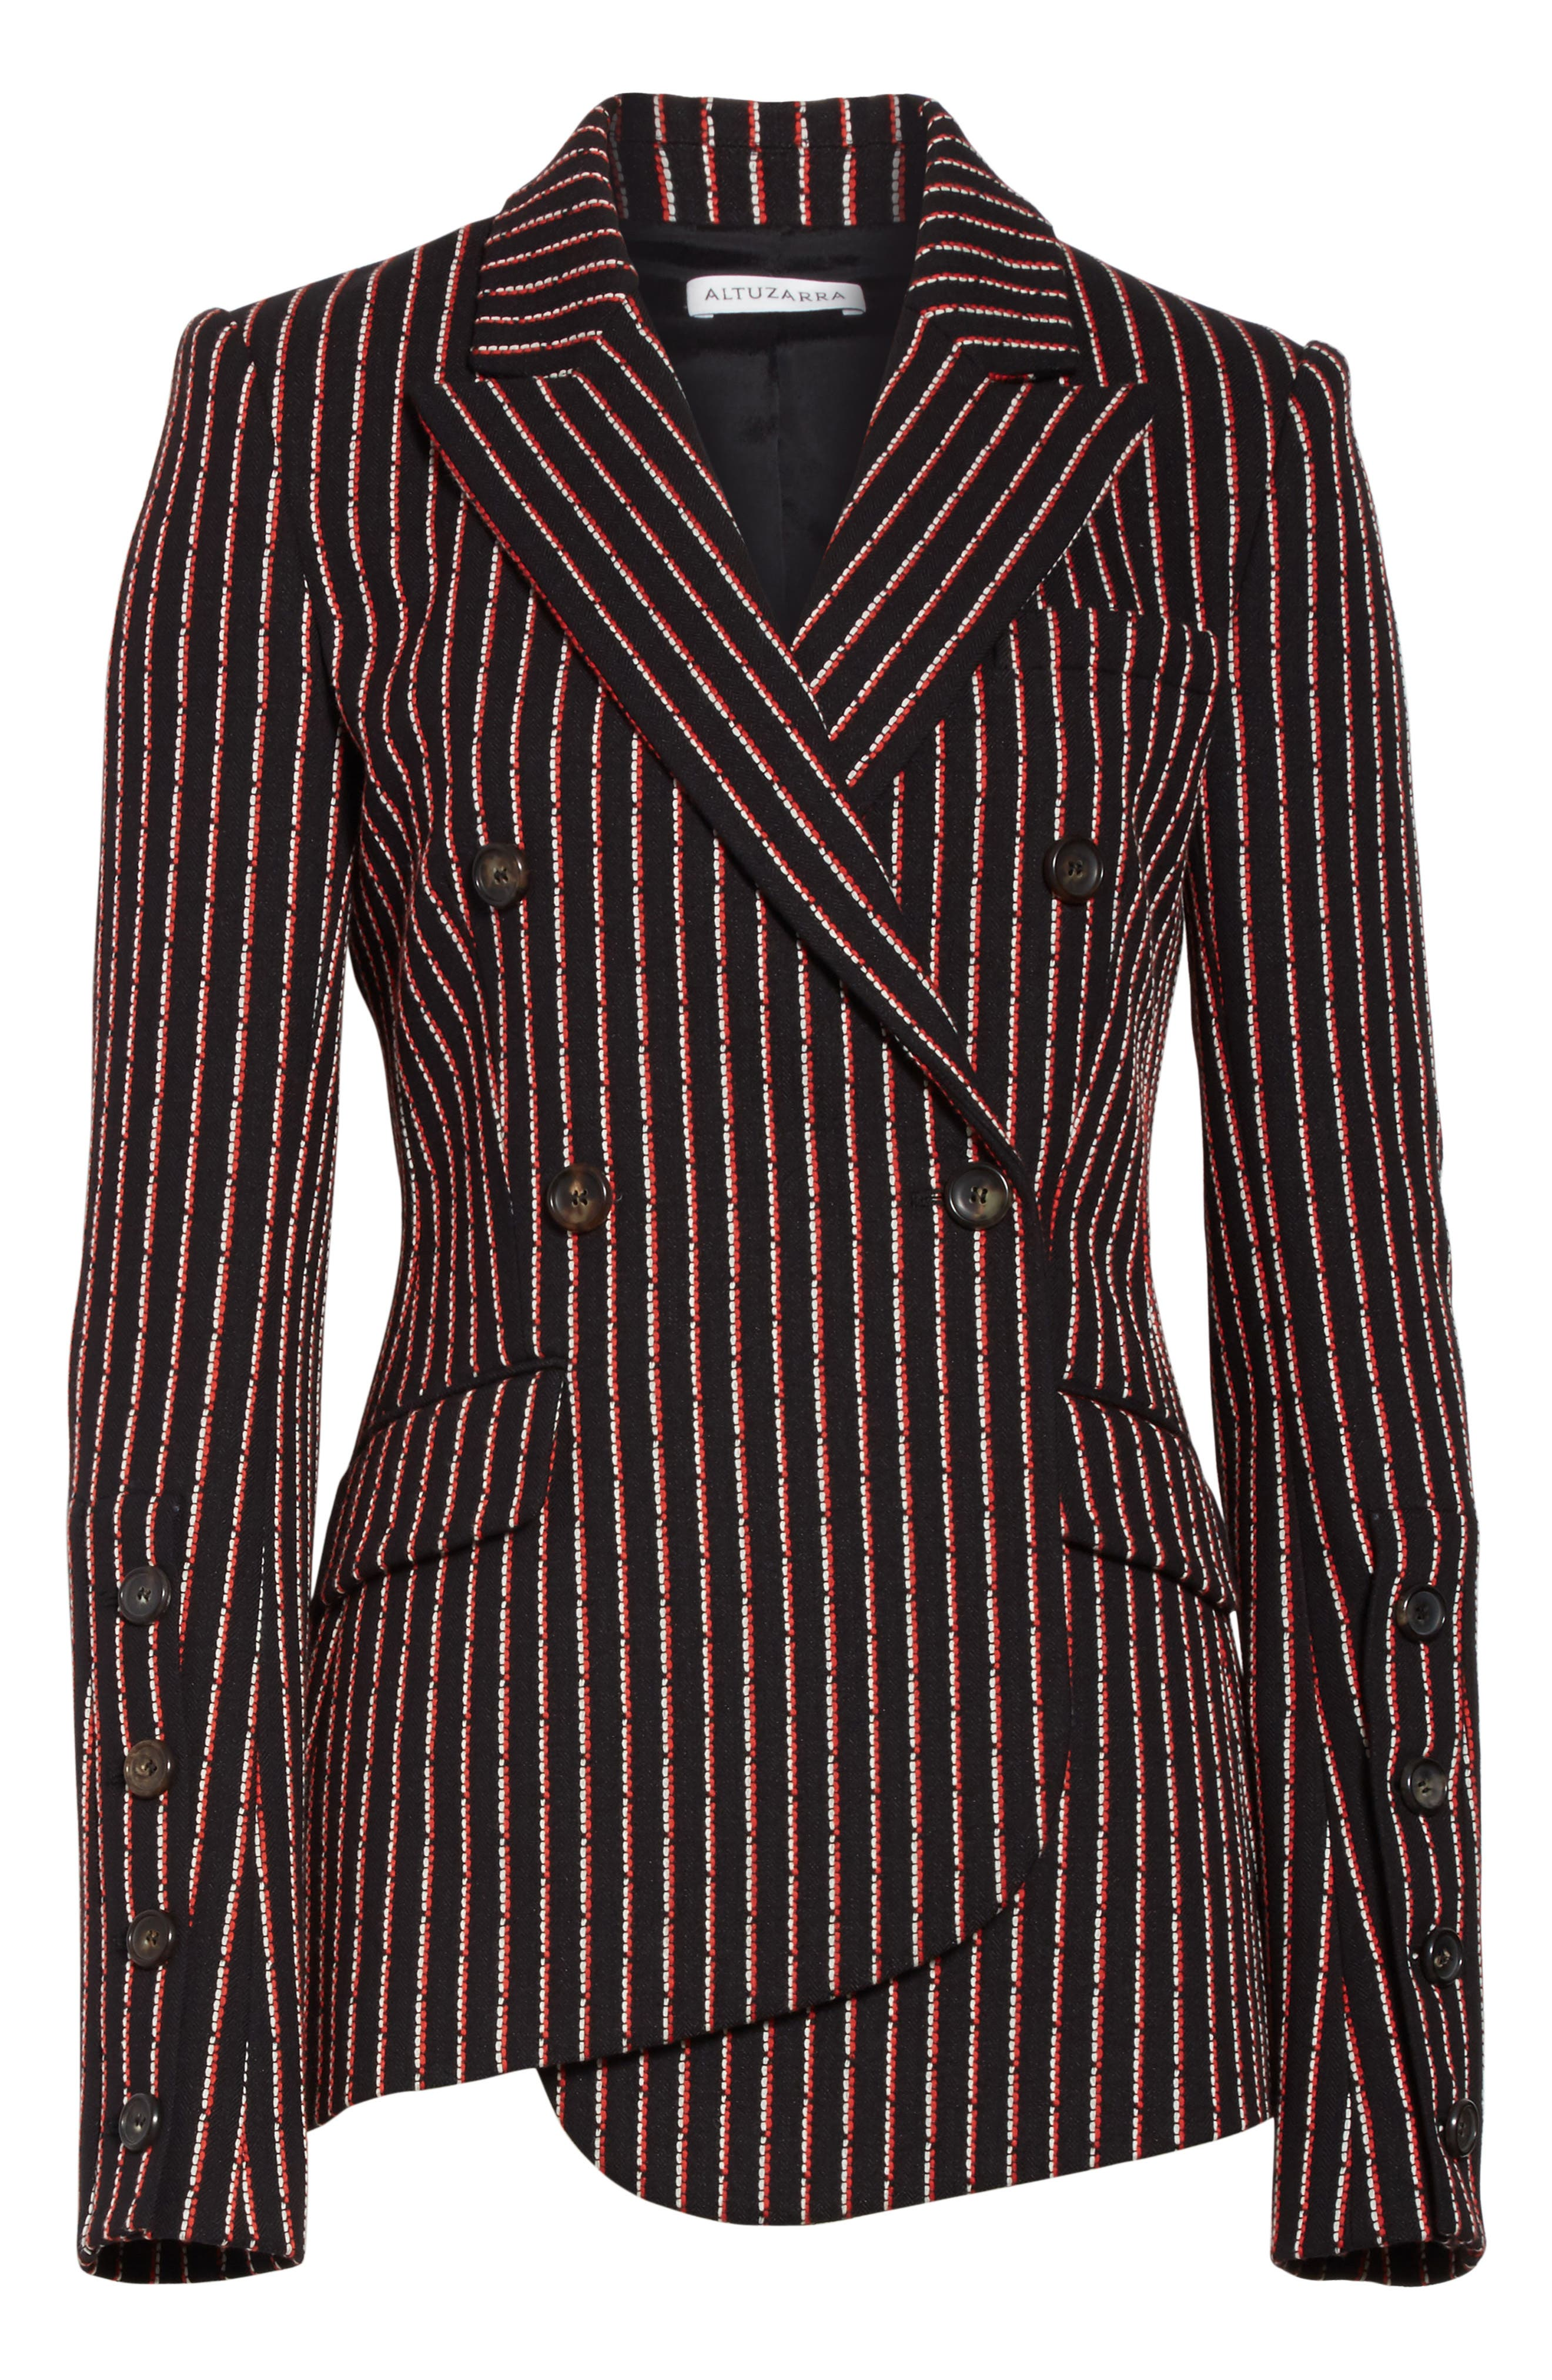 Pinstripe Double Breasted Blazer,                             Alternate thumbnail 7, color,                             Black White Persimmon